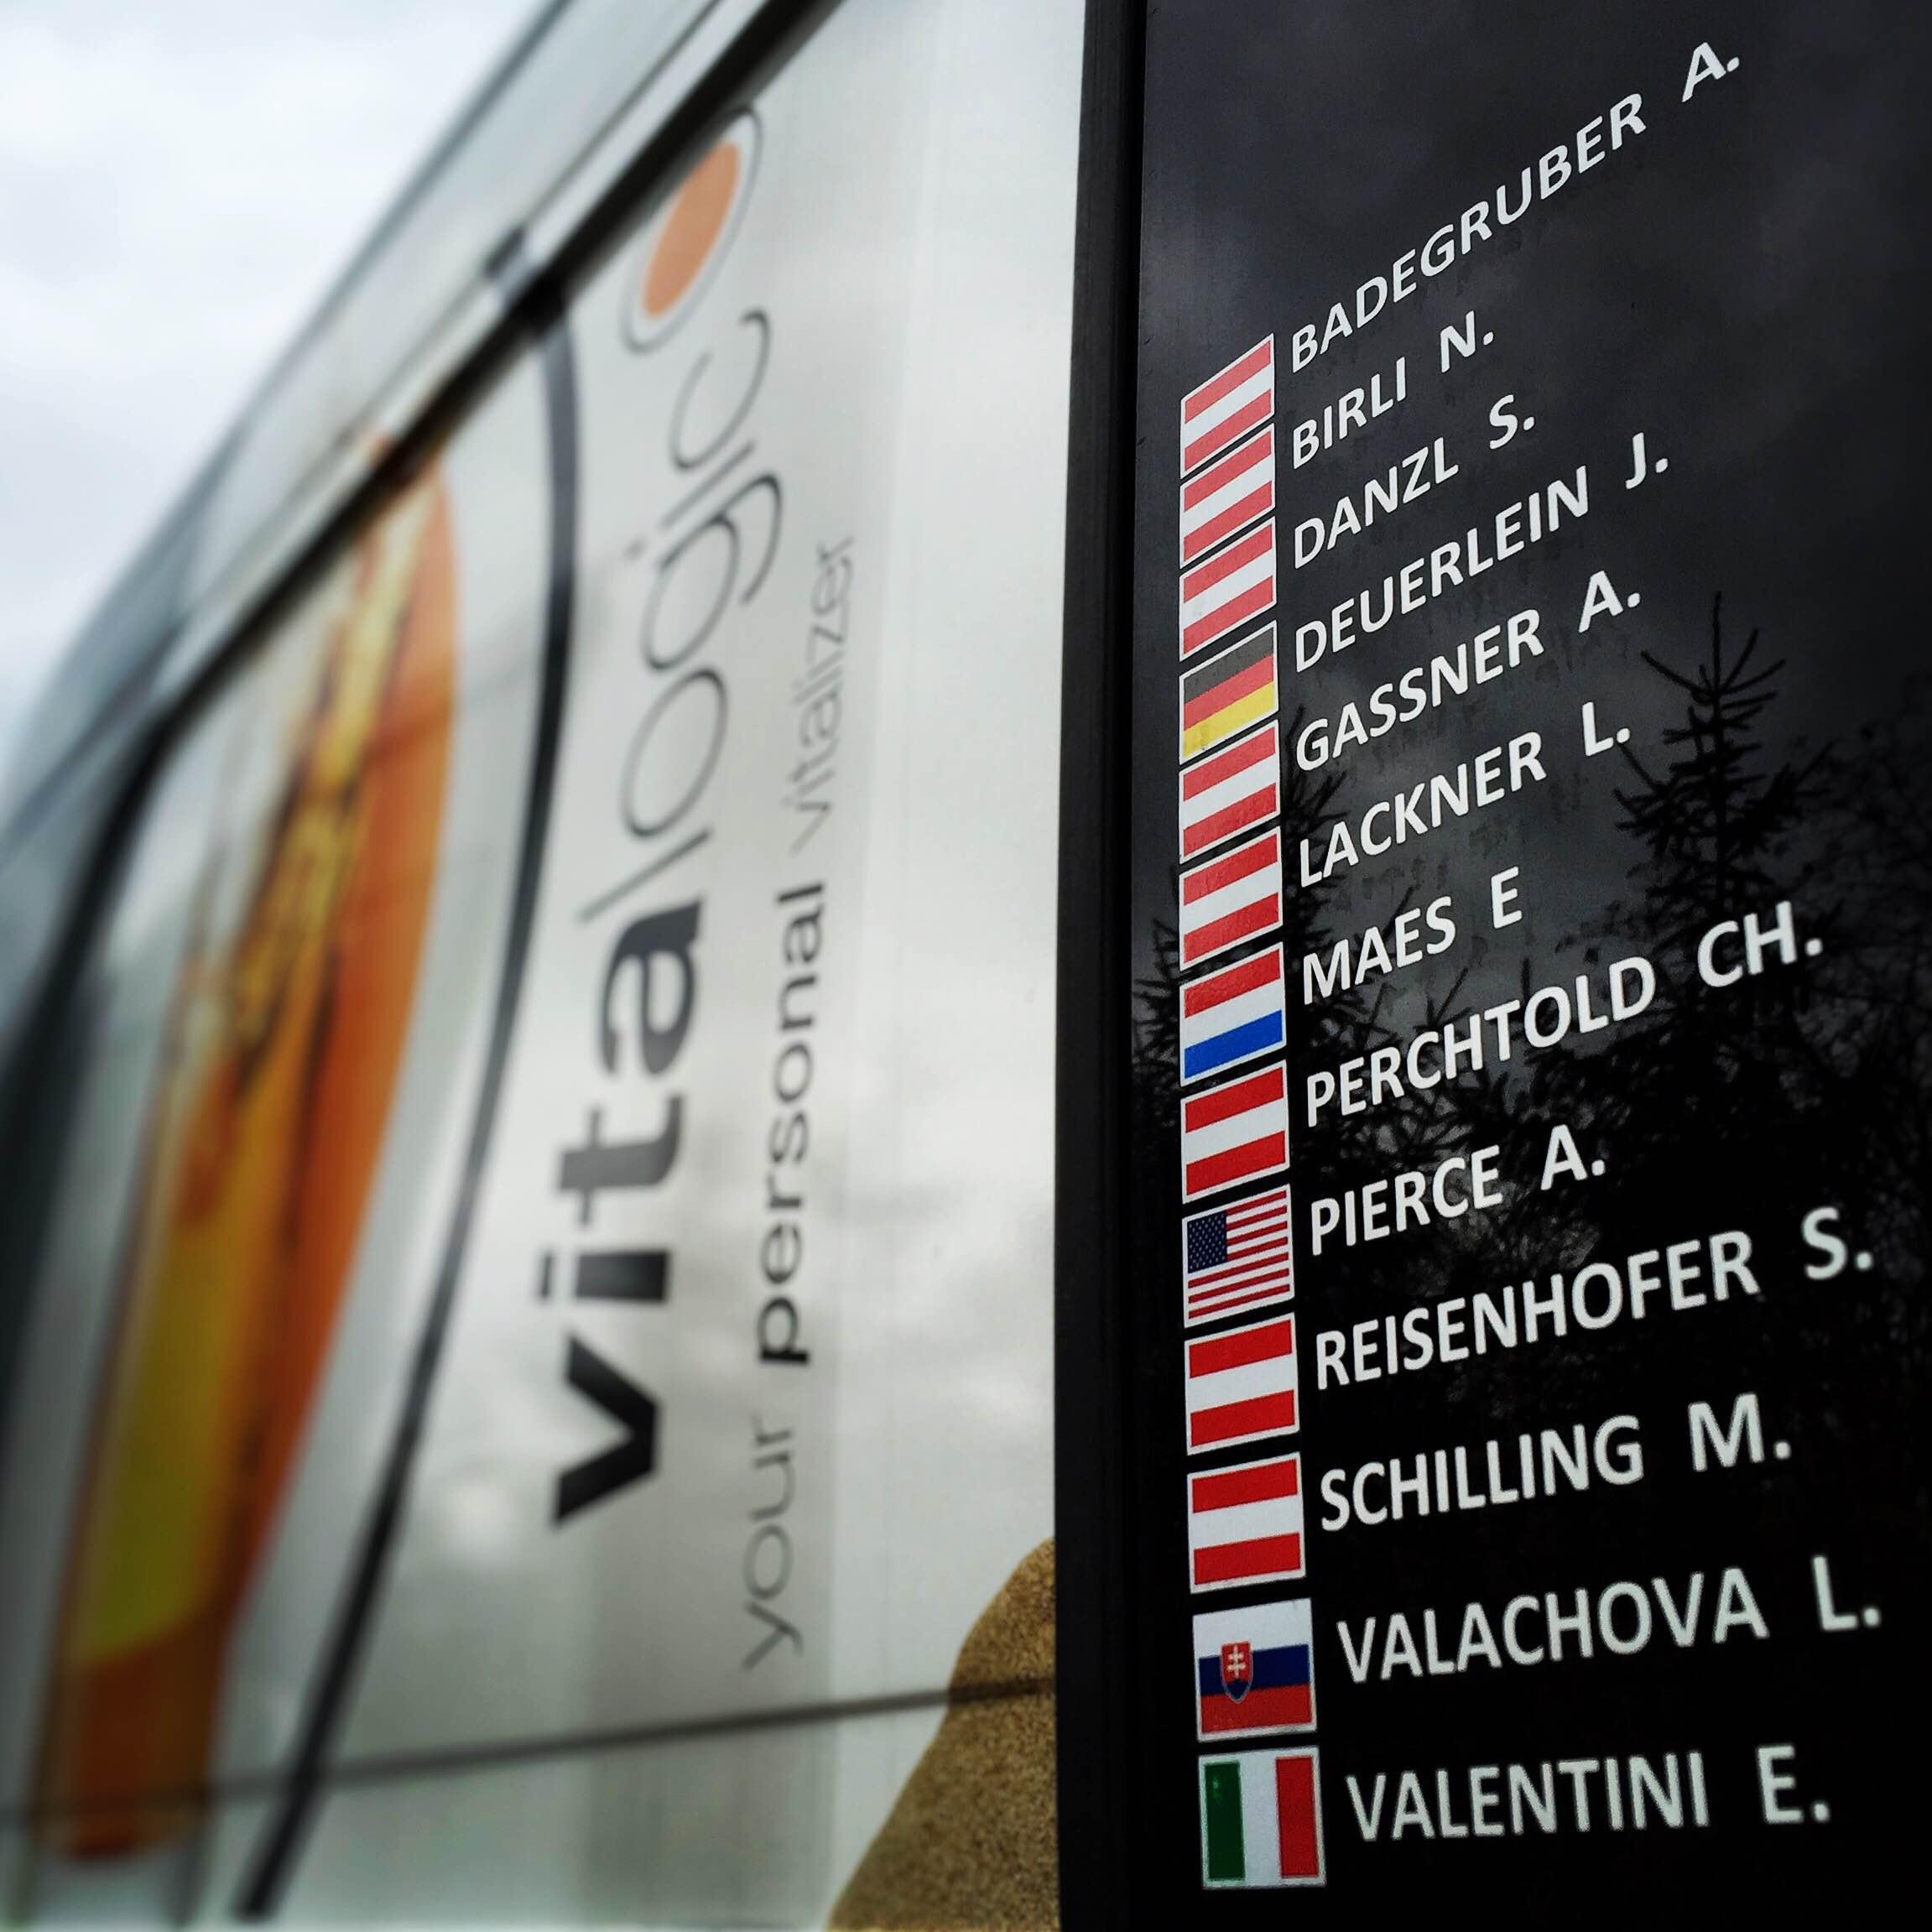 Vitalogic Astrokalb Team bus. Photo by Amber Pierce.